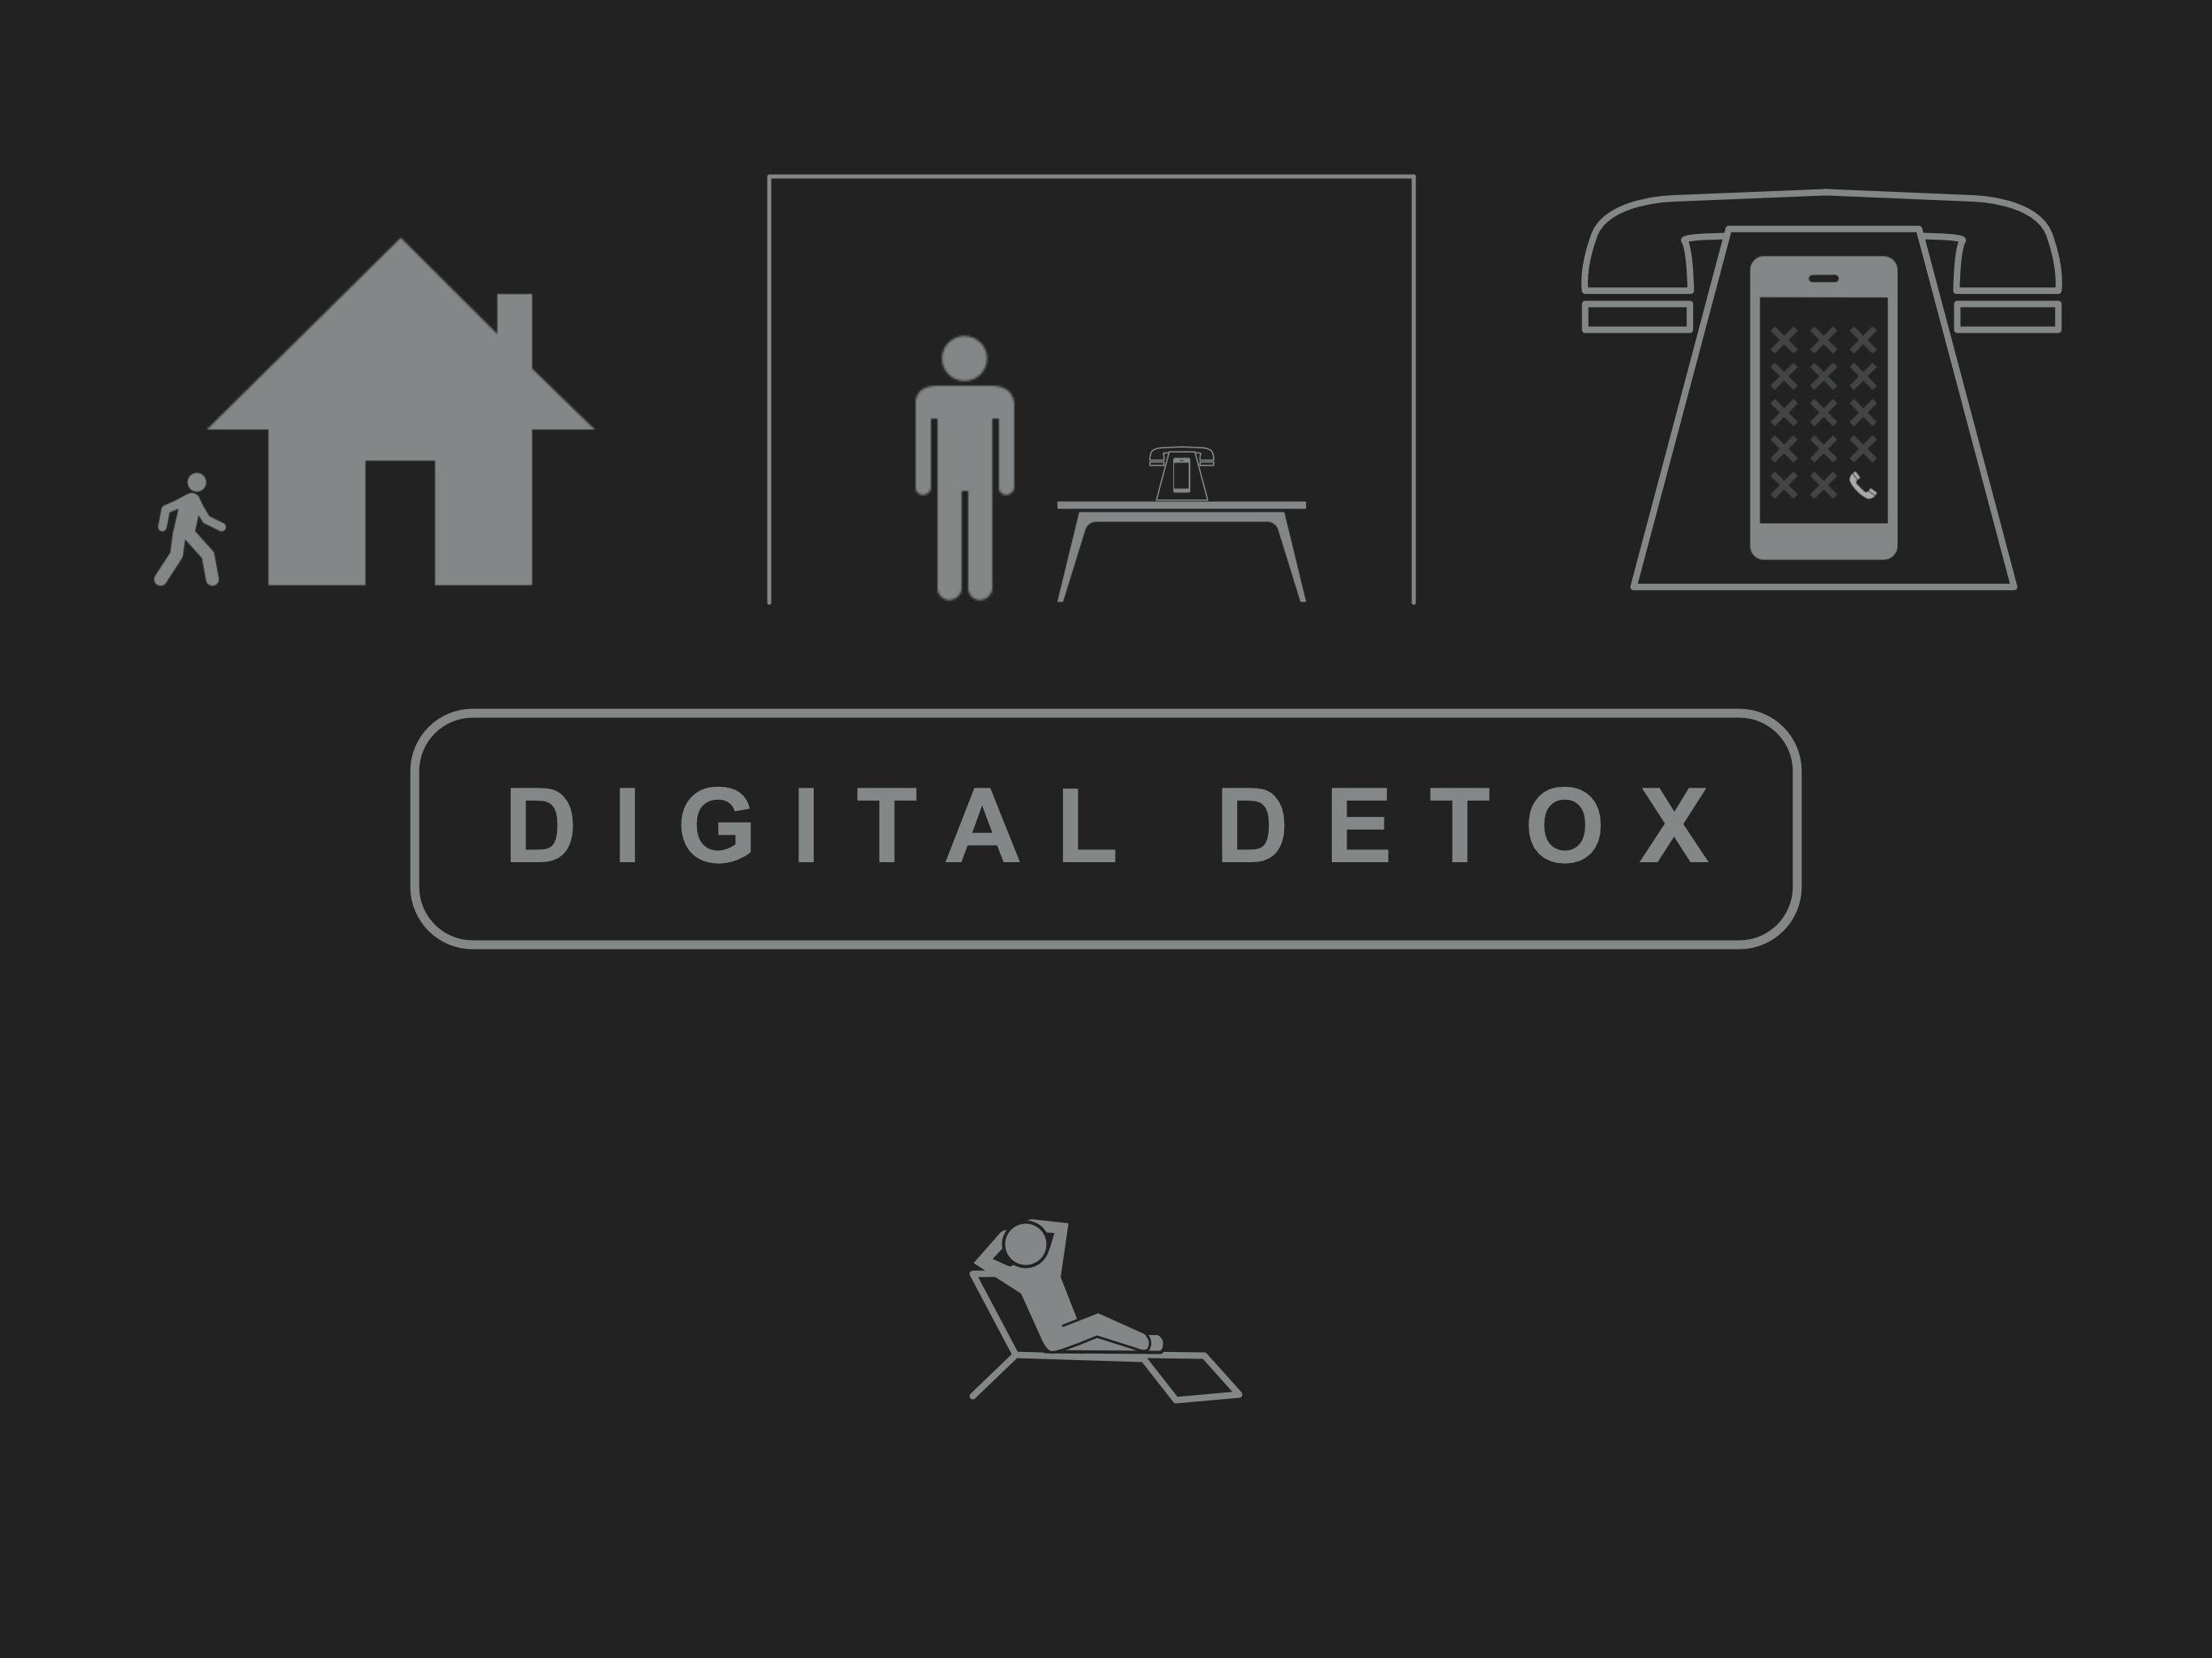 Digitaldetox-3500-3500